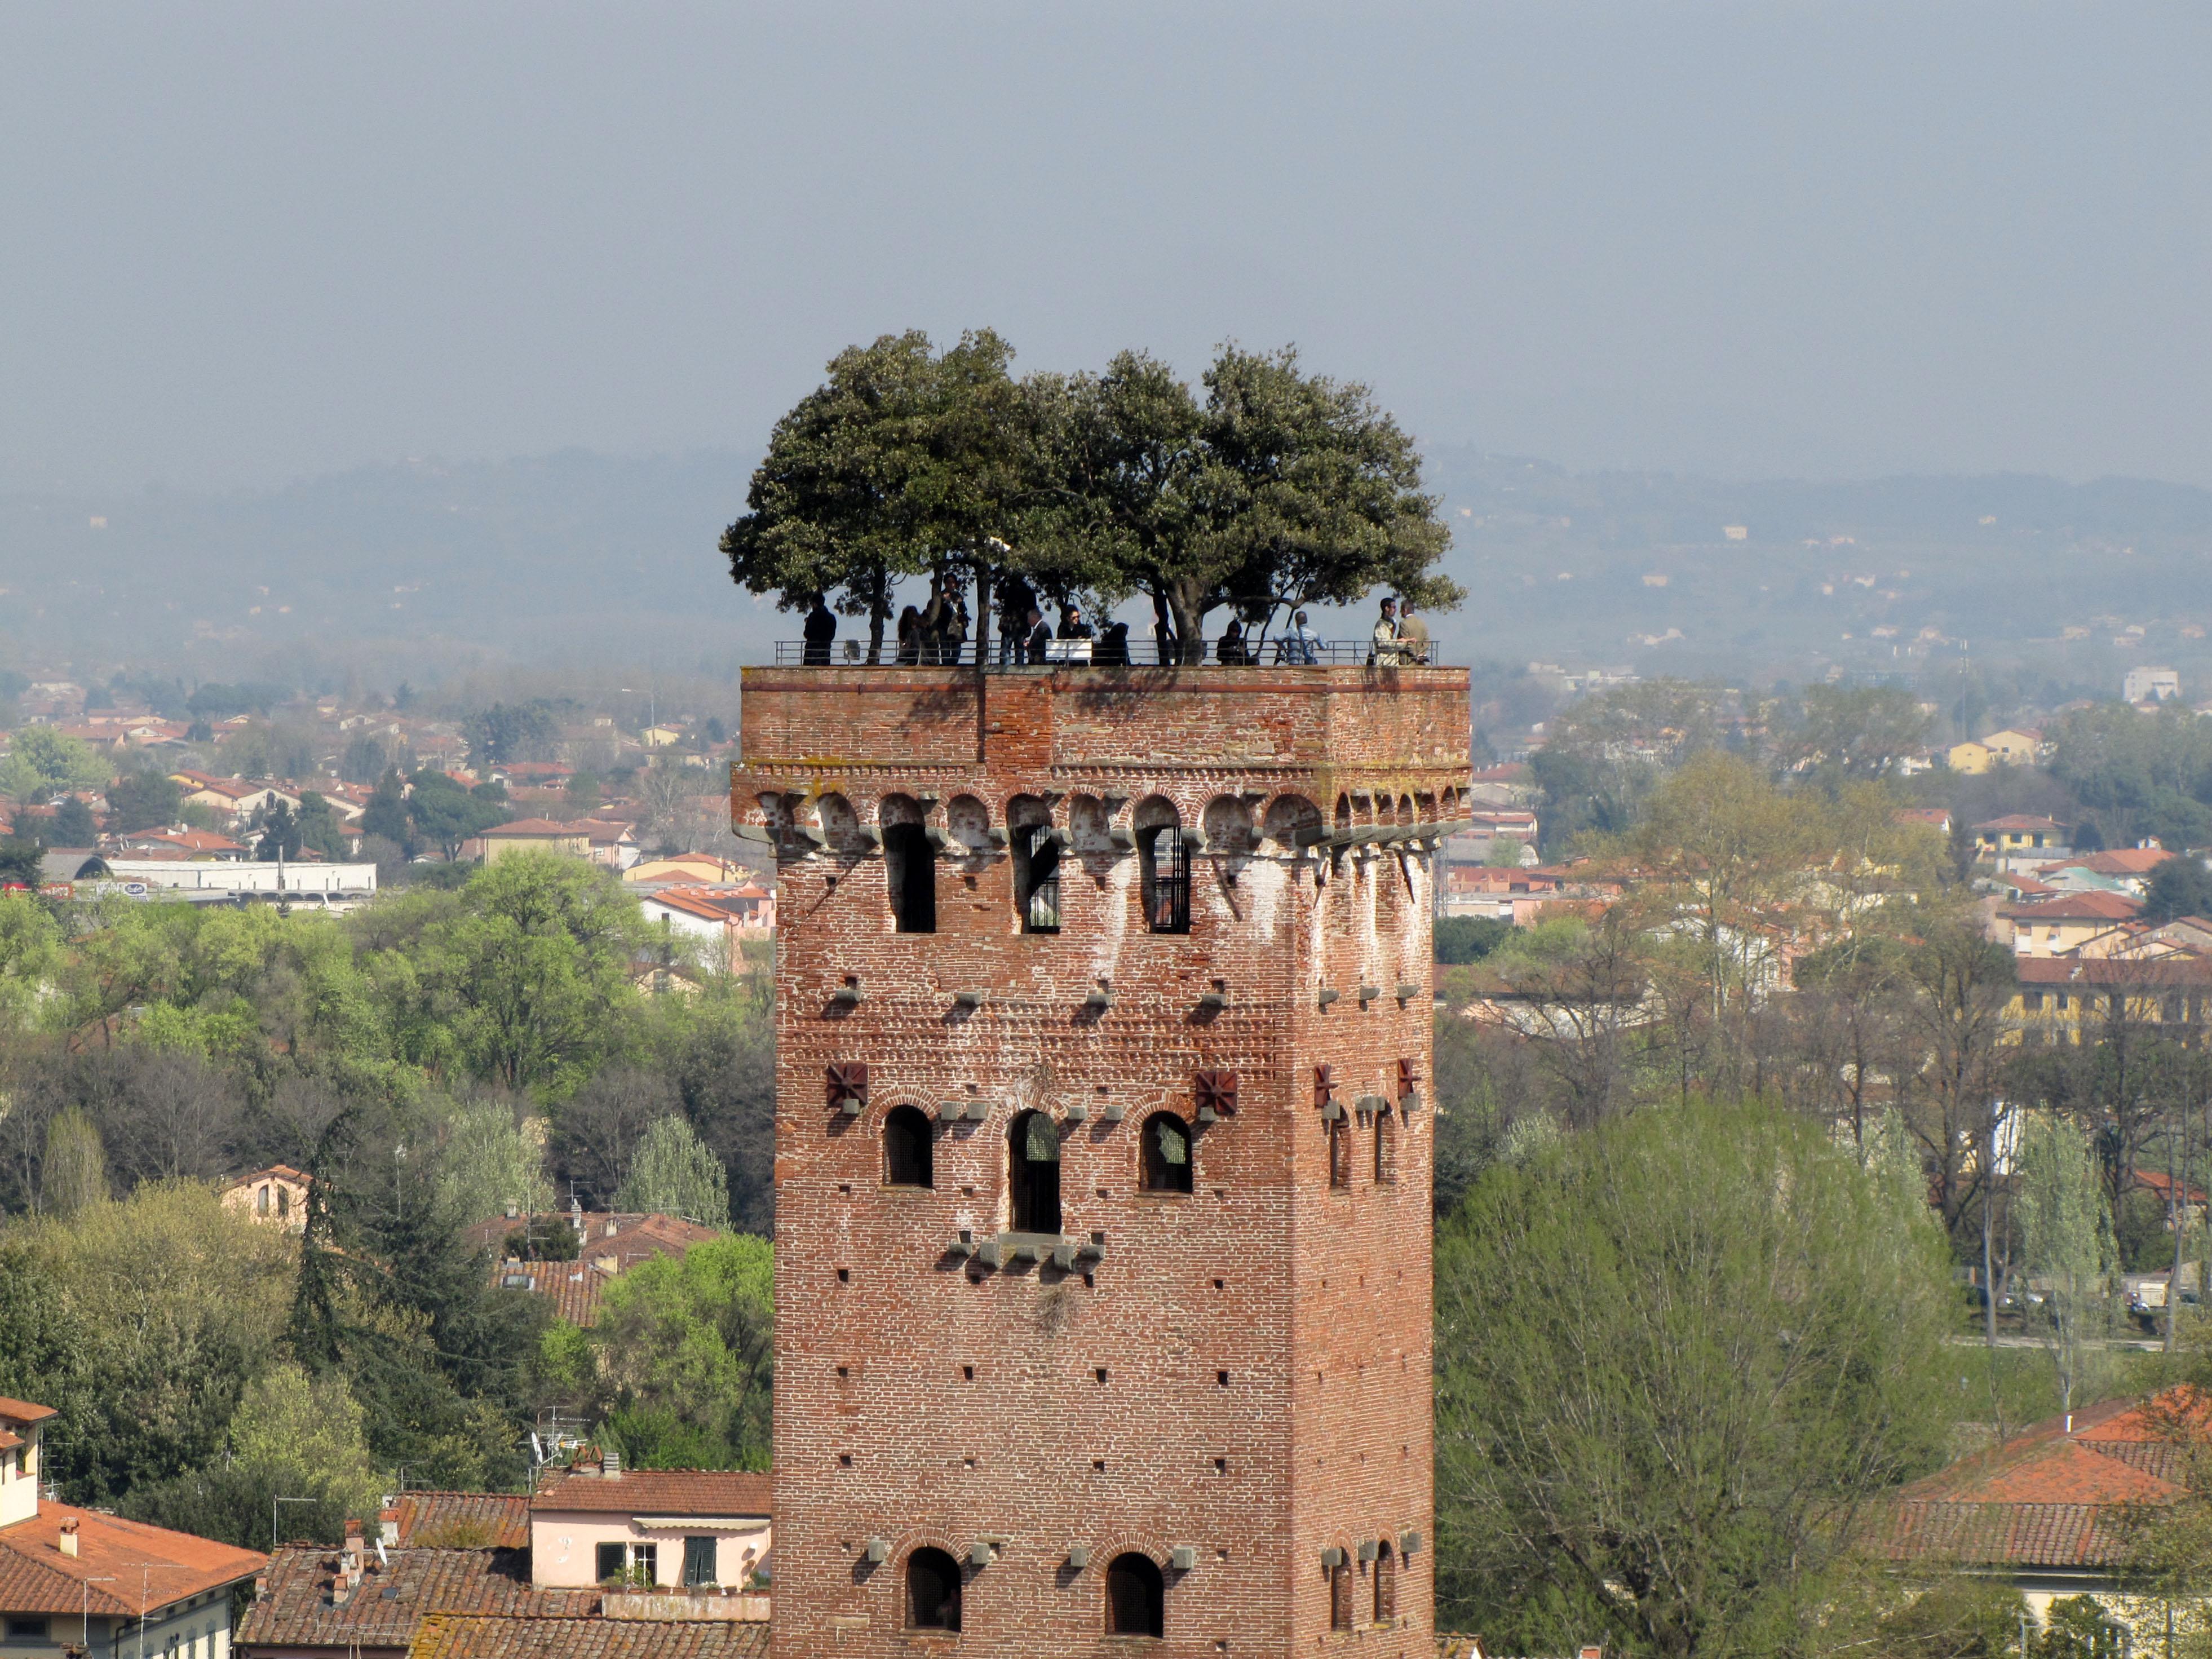 Torre Guinigi di Lucca